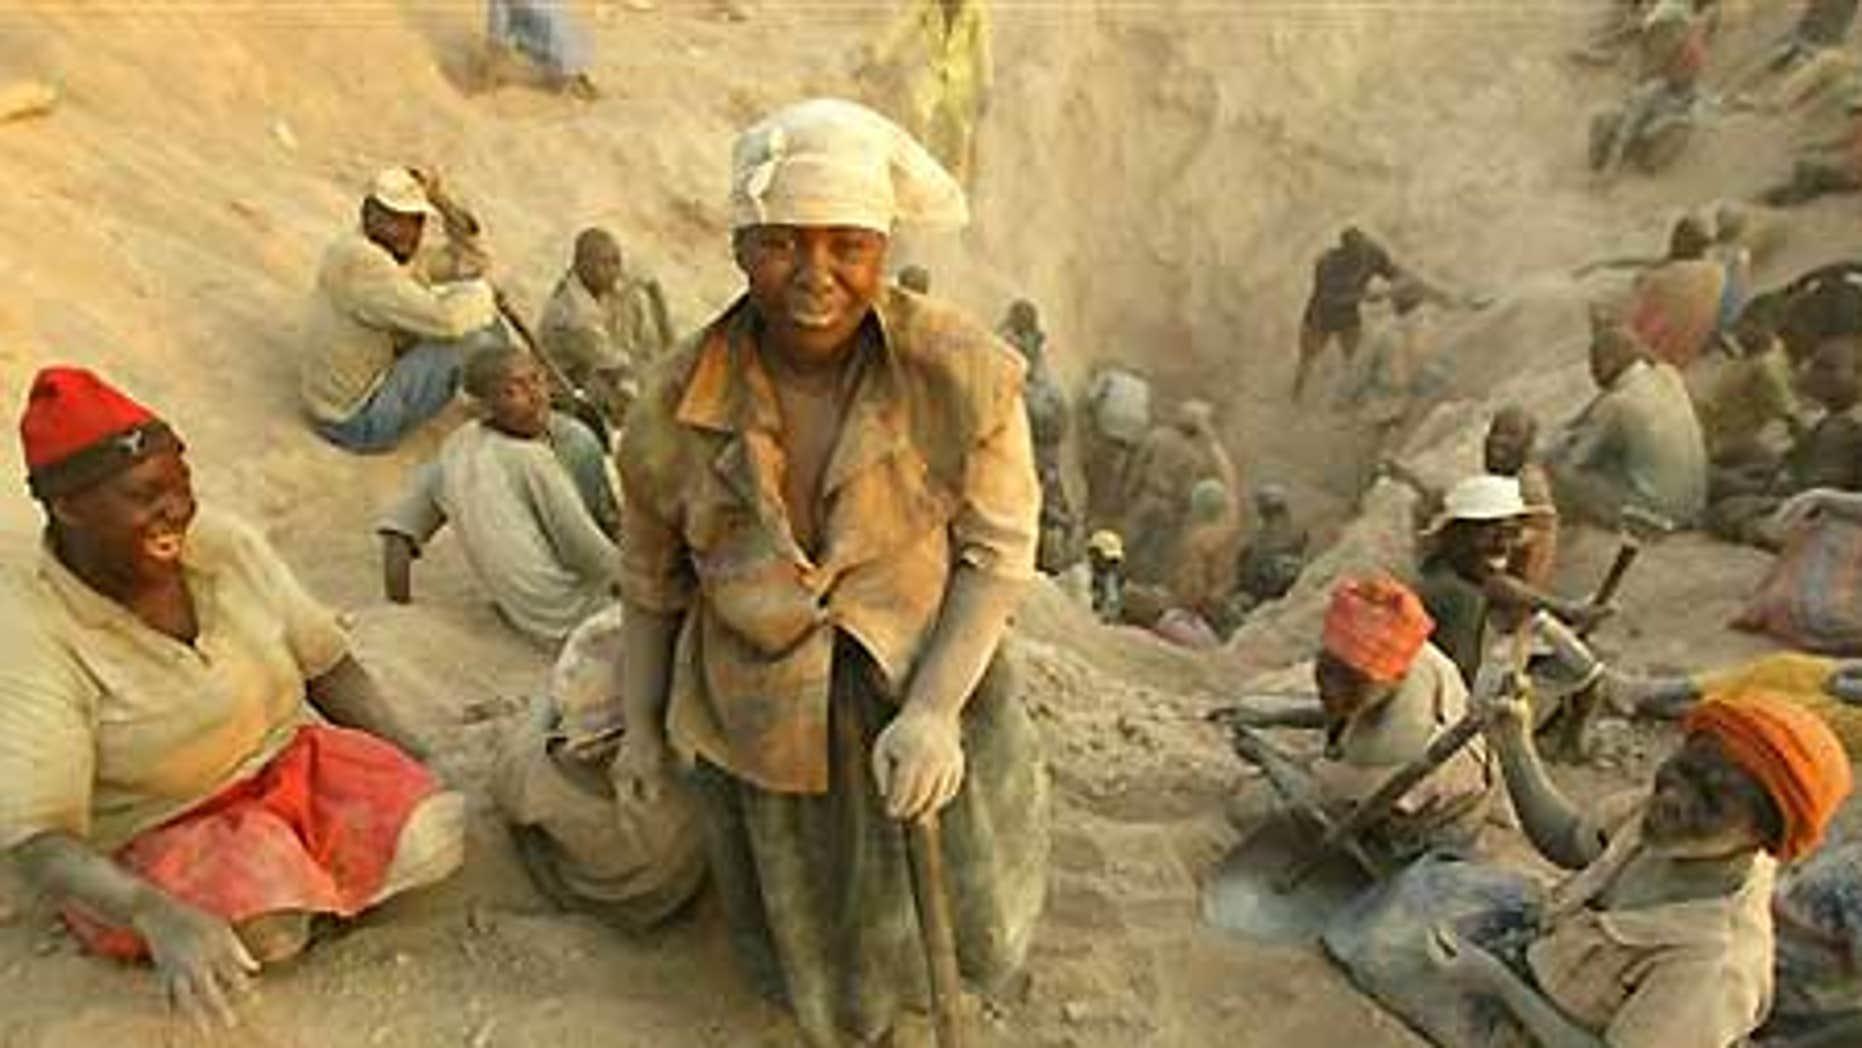 Nov. 1, 2006: Miners dig for diamonds in Marange, eastern Zimbabwe.